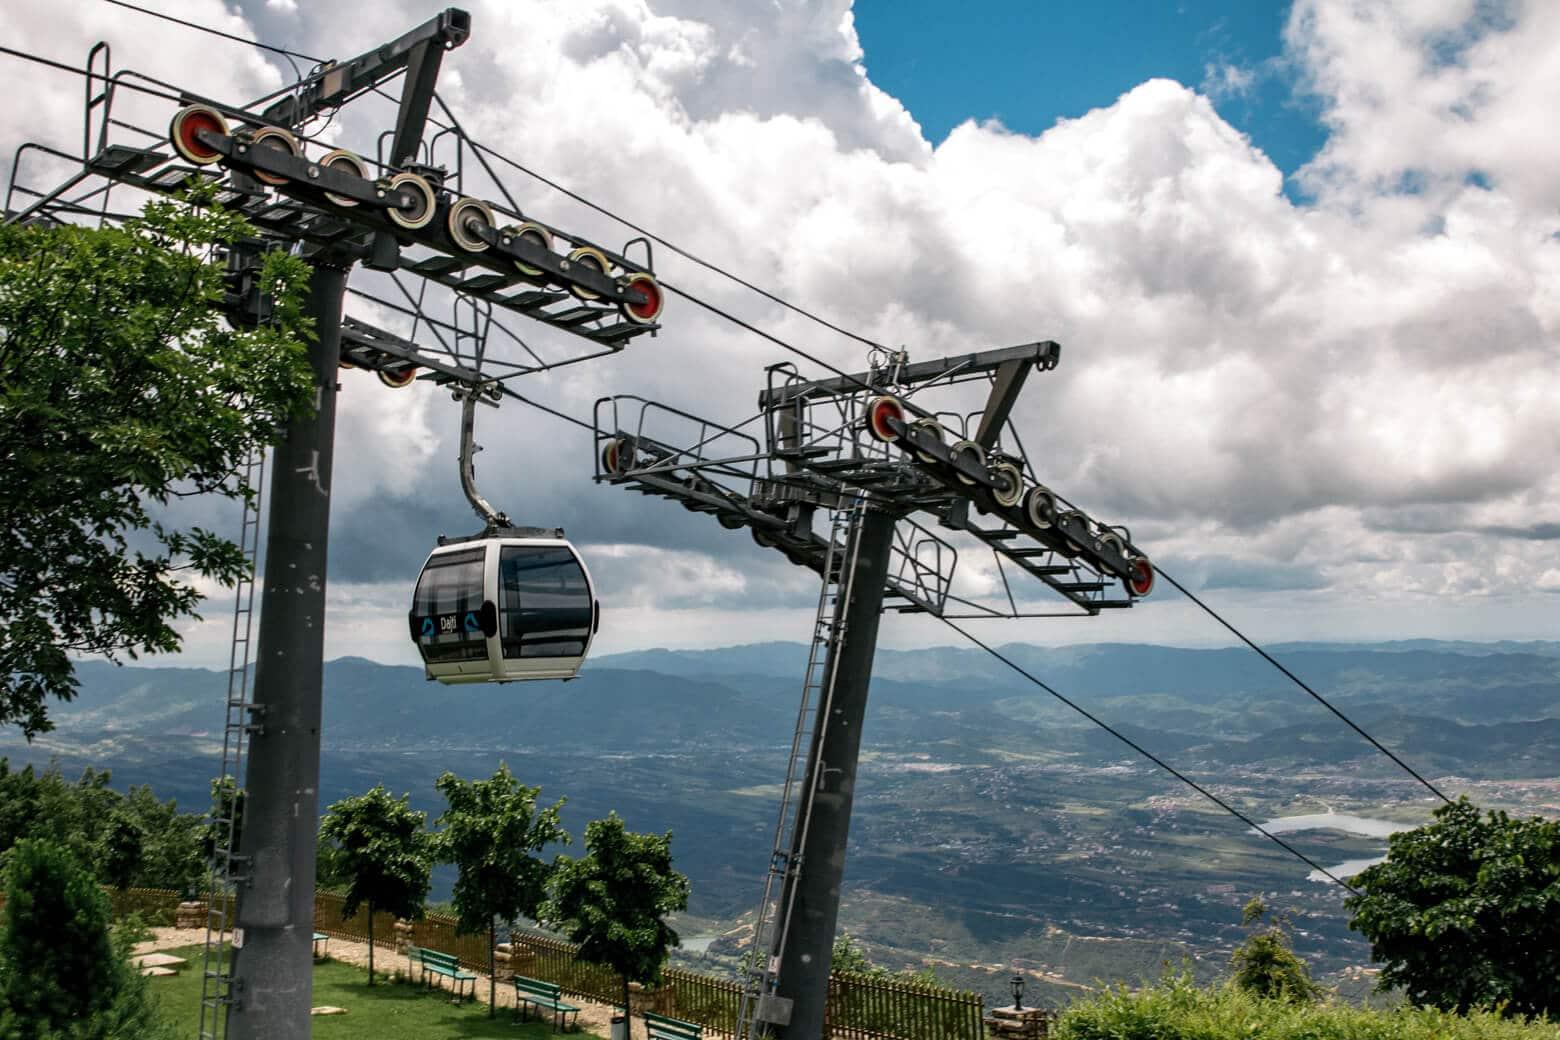 Mount Dajti Cable Car